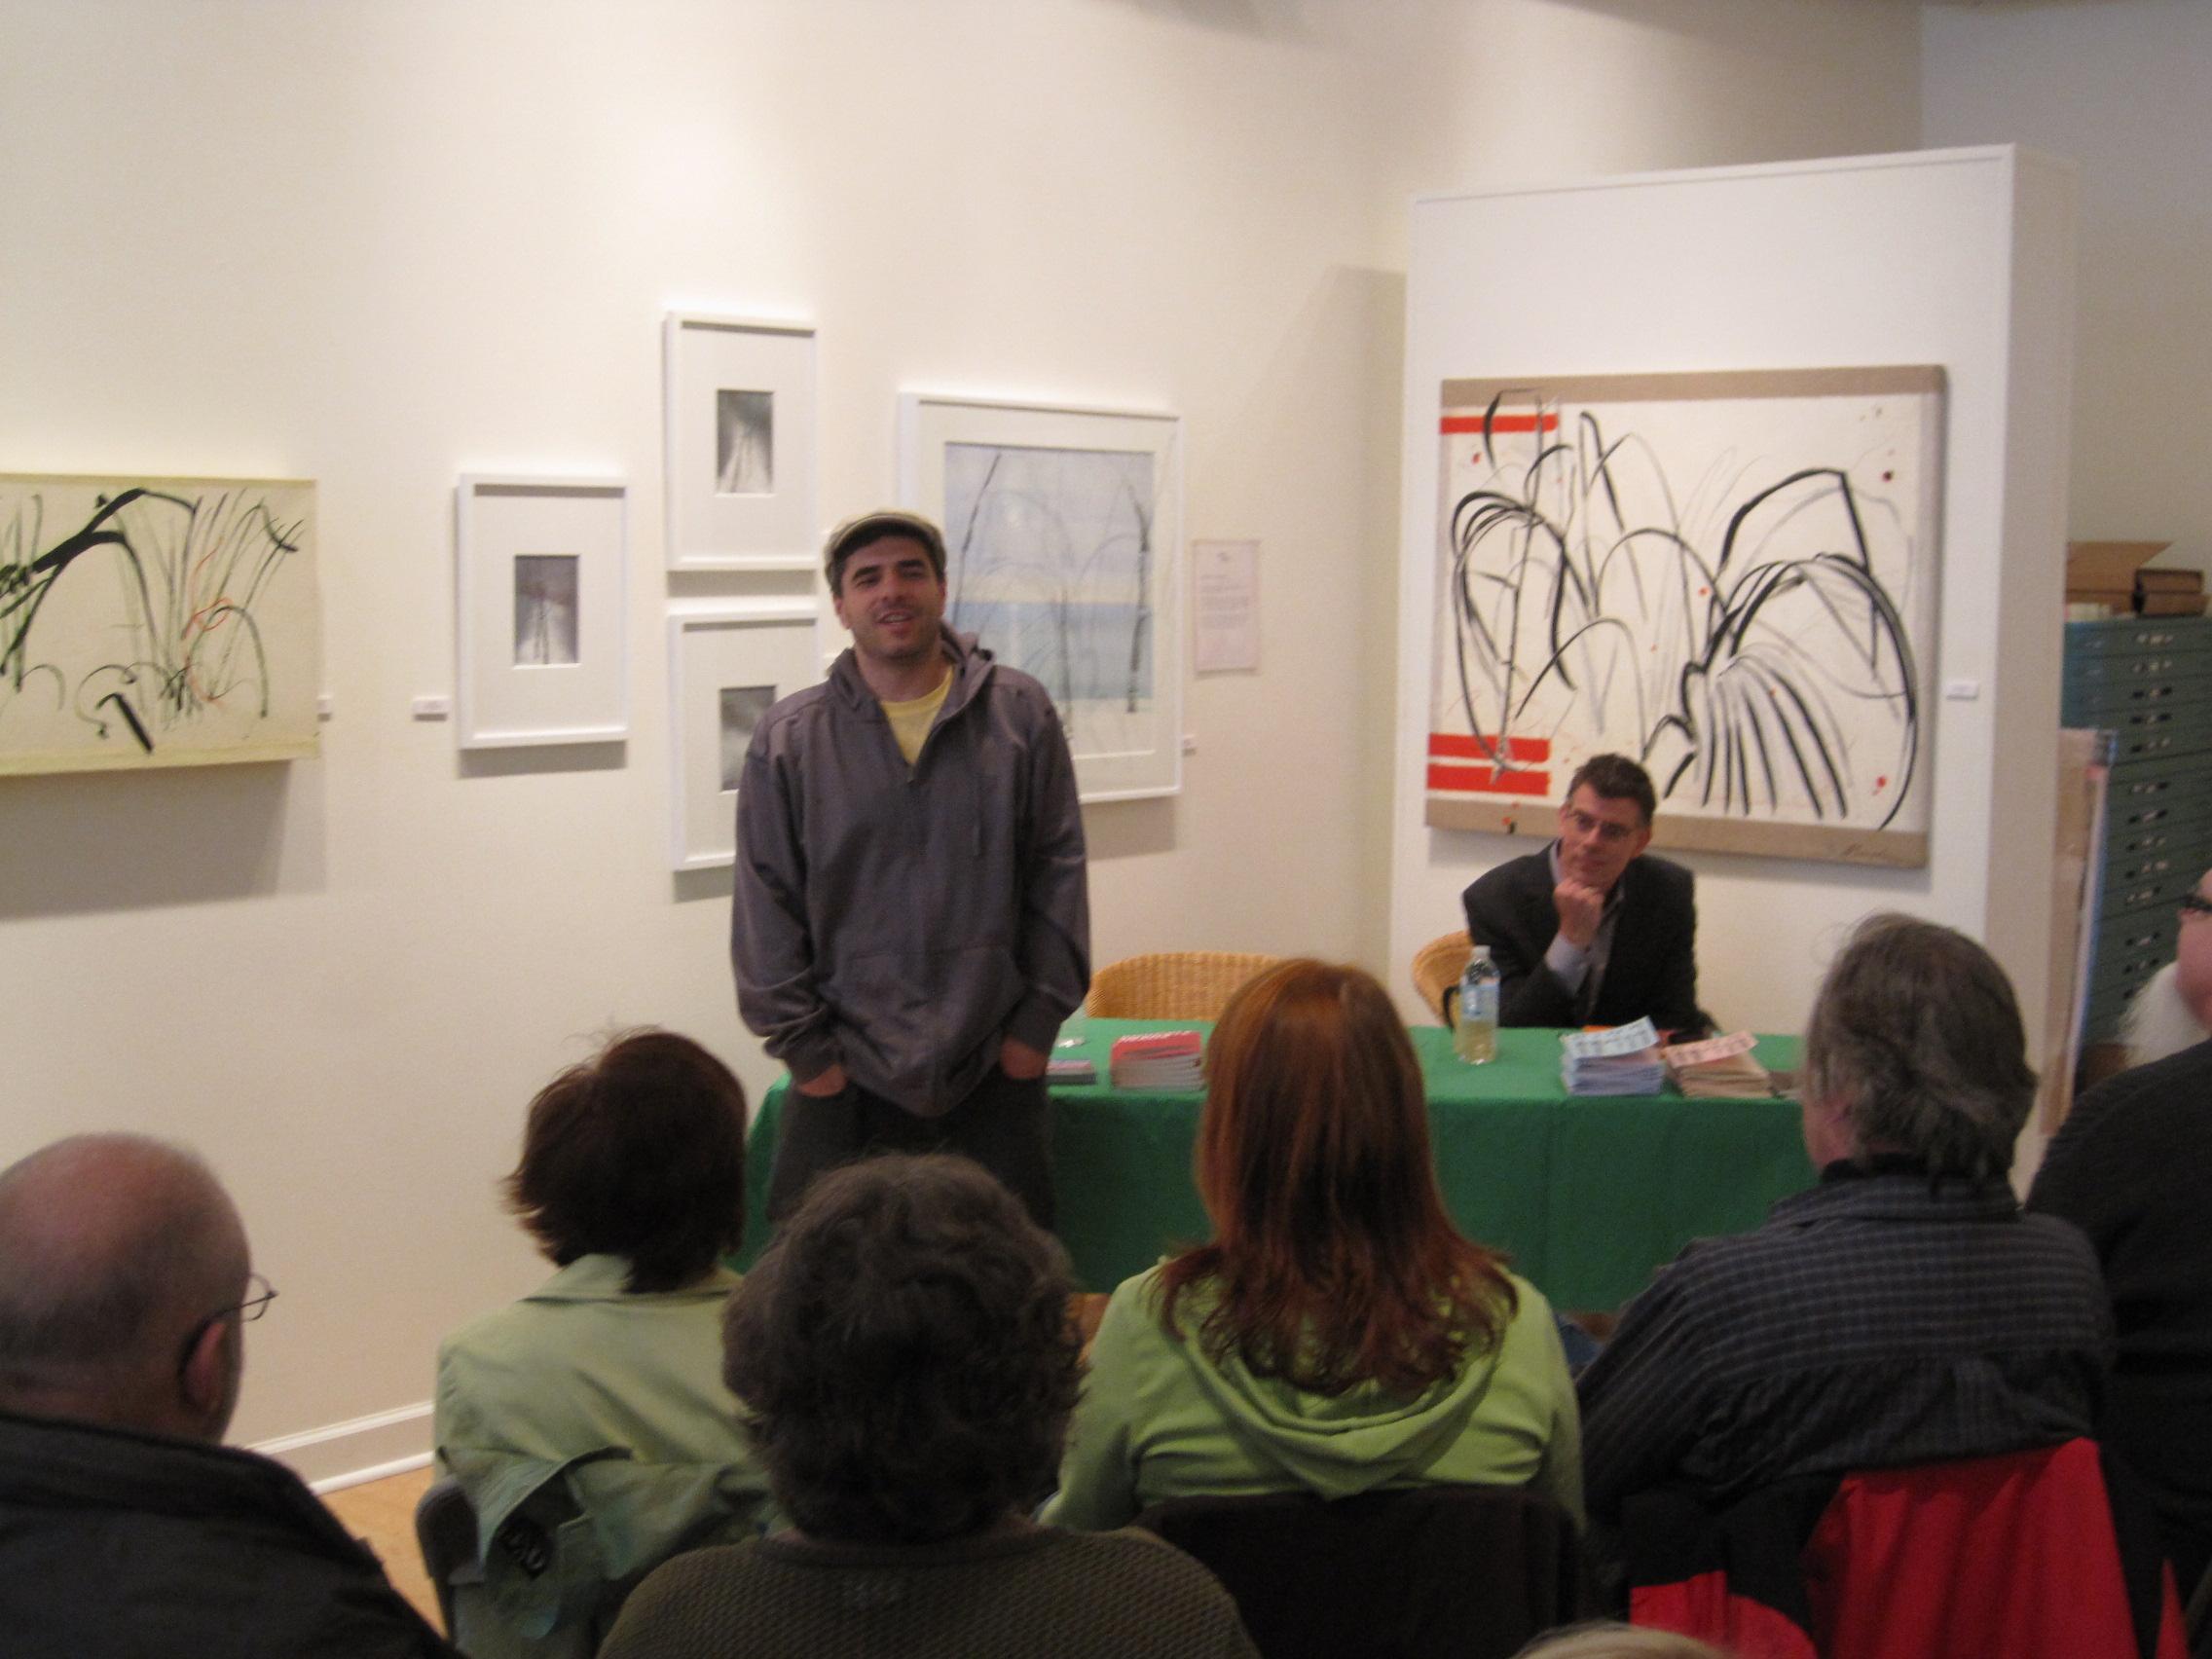 midwest-literary-walk-2011-159